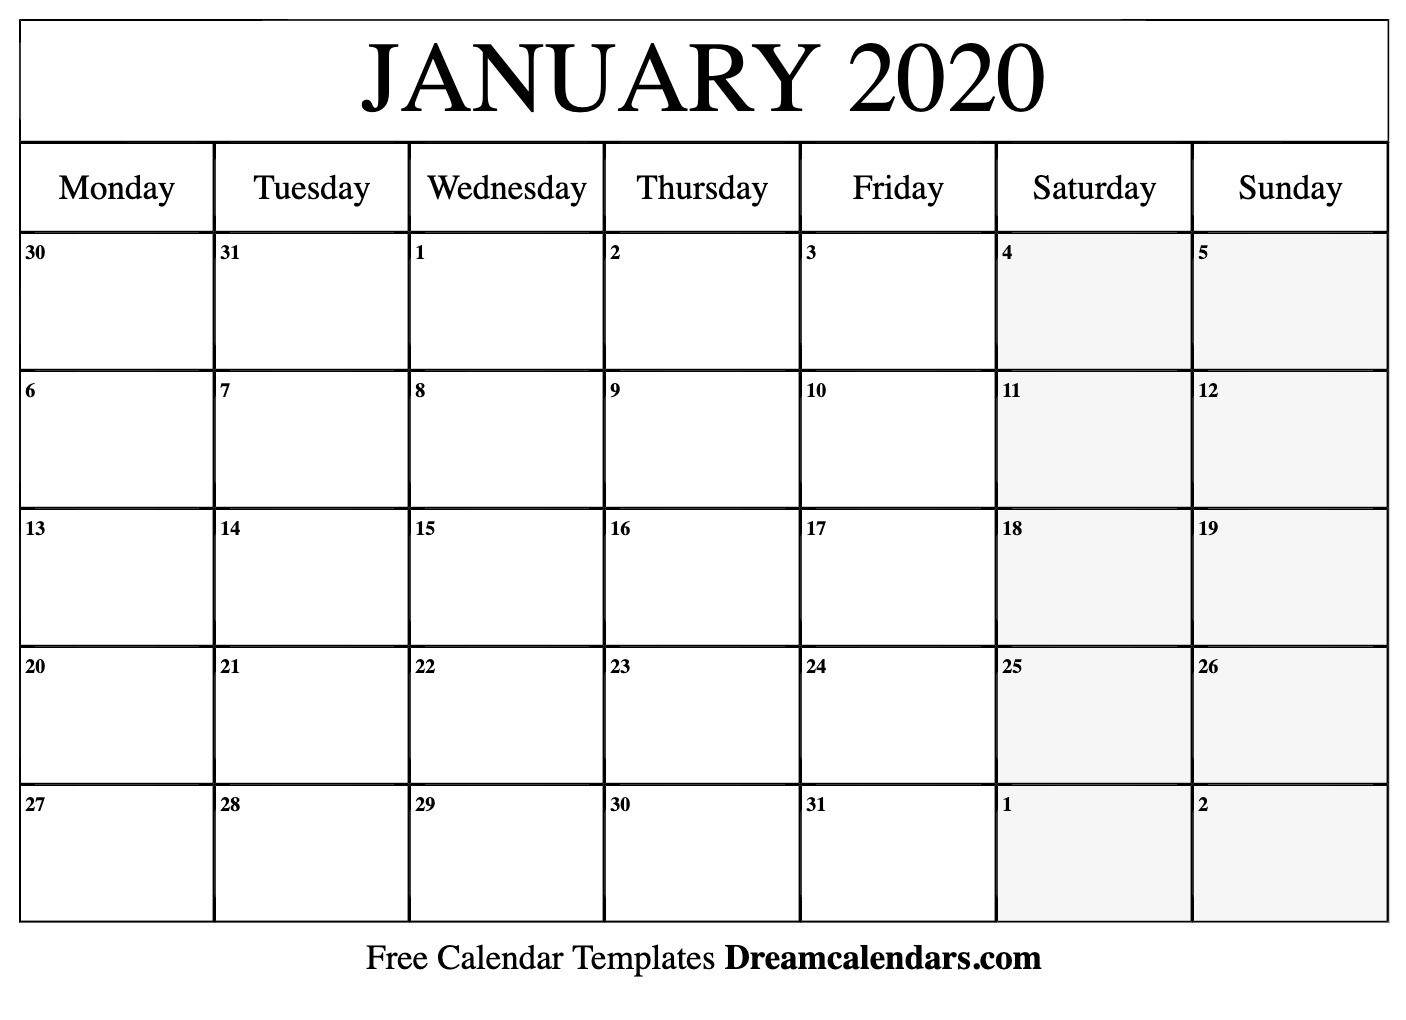 Printable January 2020 Calendar-January 2020 Printable Calendar With Holidays